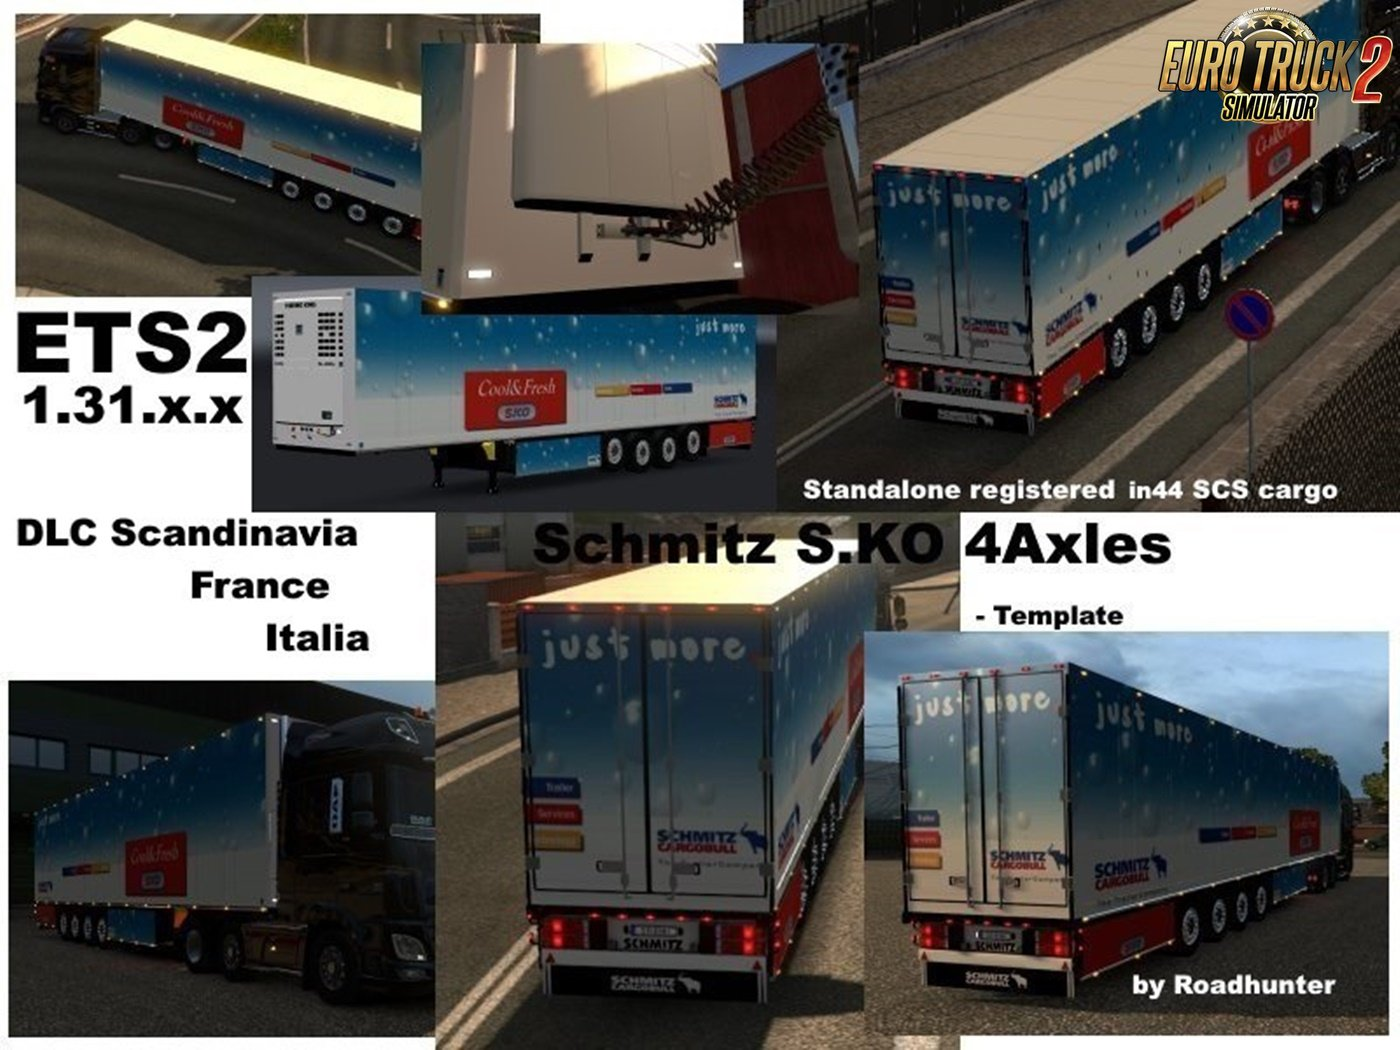 Schmitz Cargobull S.KO 4axles Reefer v1.3 [1.31.x]